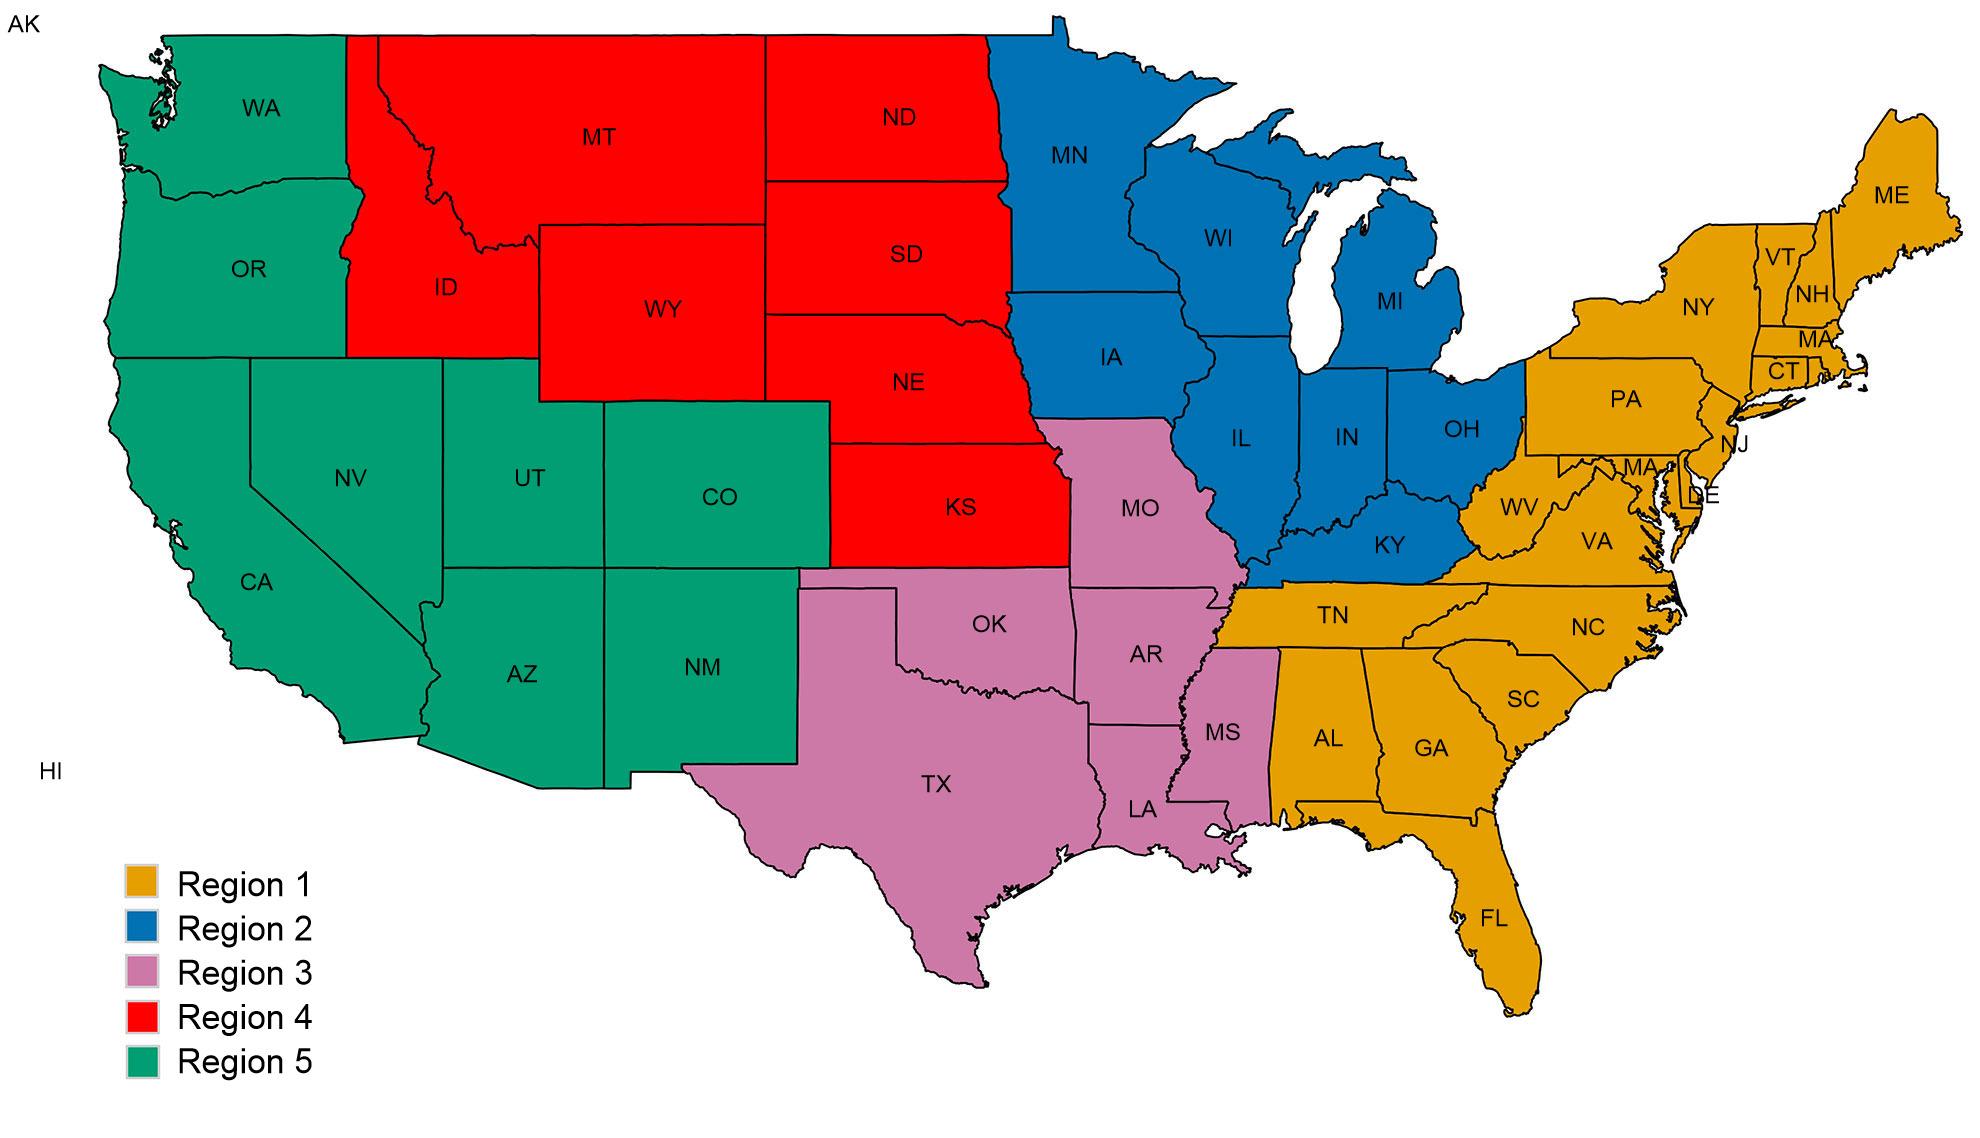 USDA veterinary services regions